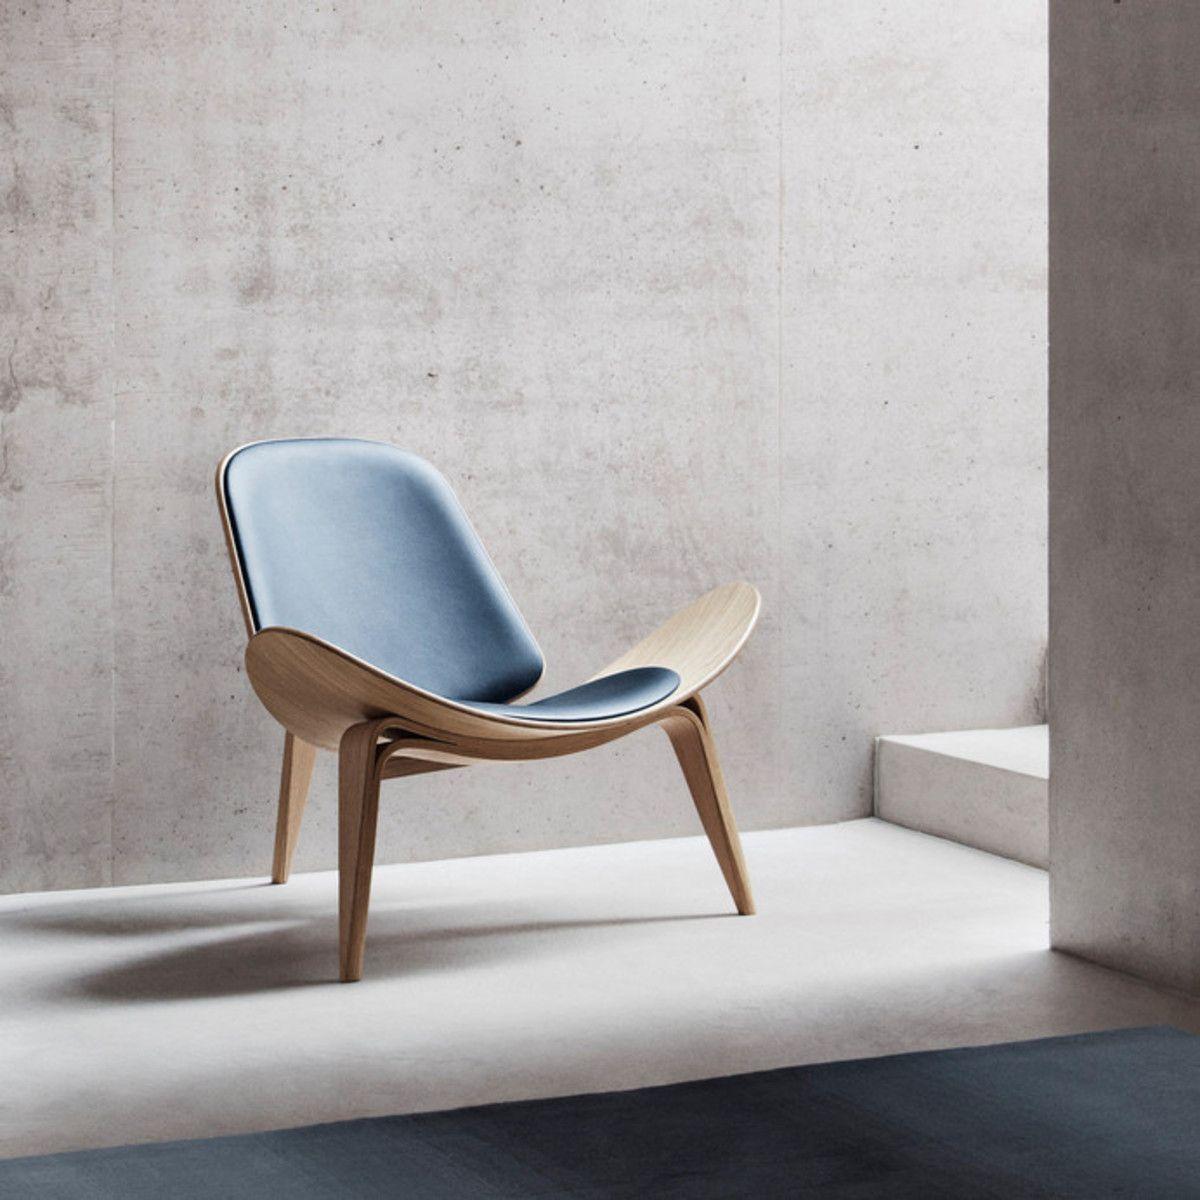 Random Inspiration 281 Chair Design Furniture Design Shell Chair